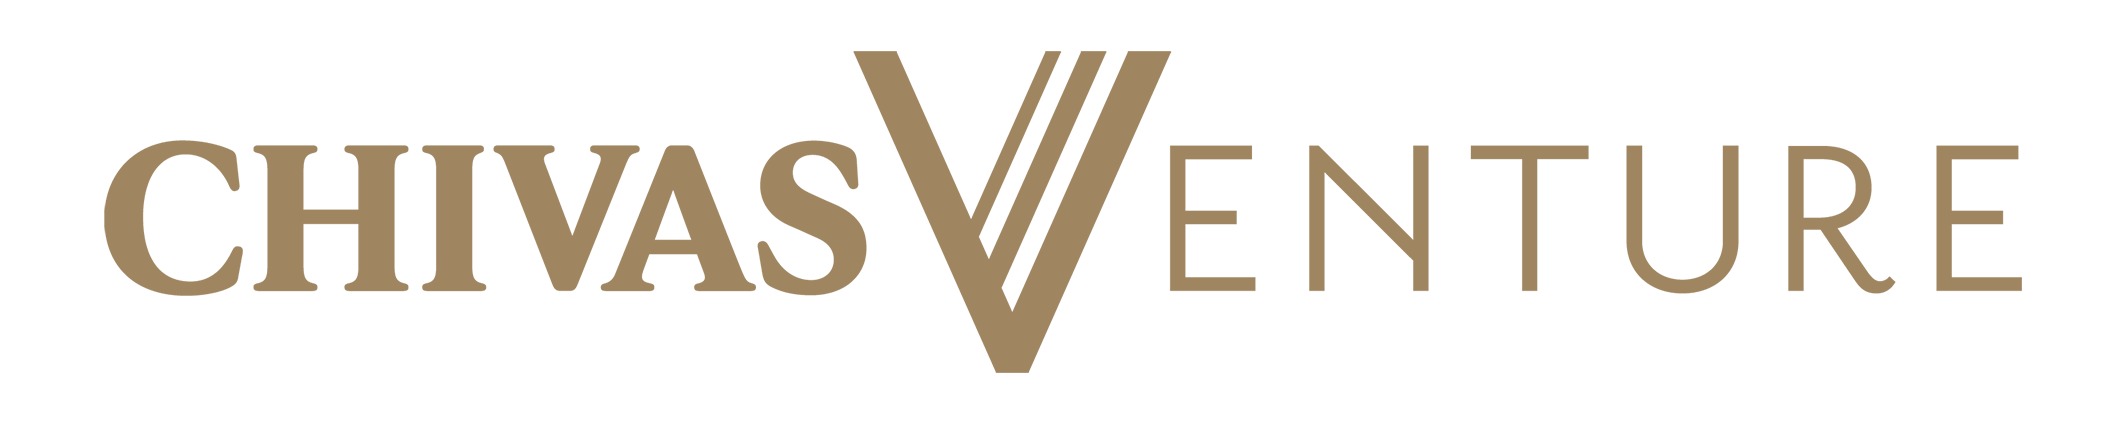 chivasventure_new_logo